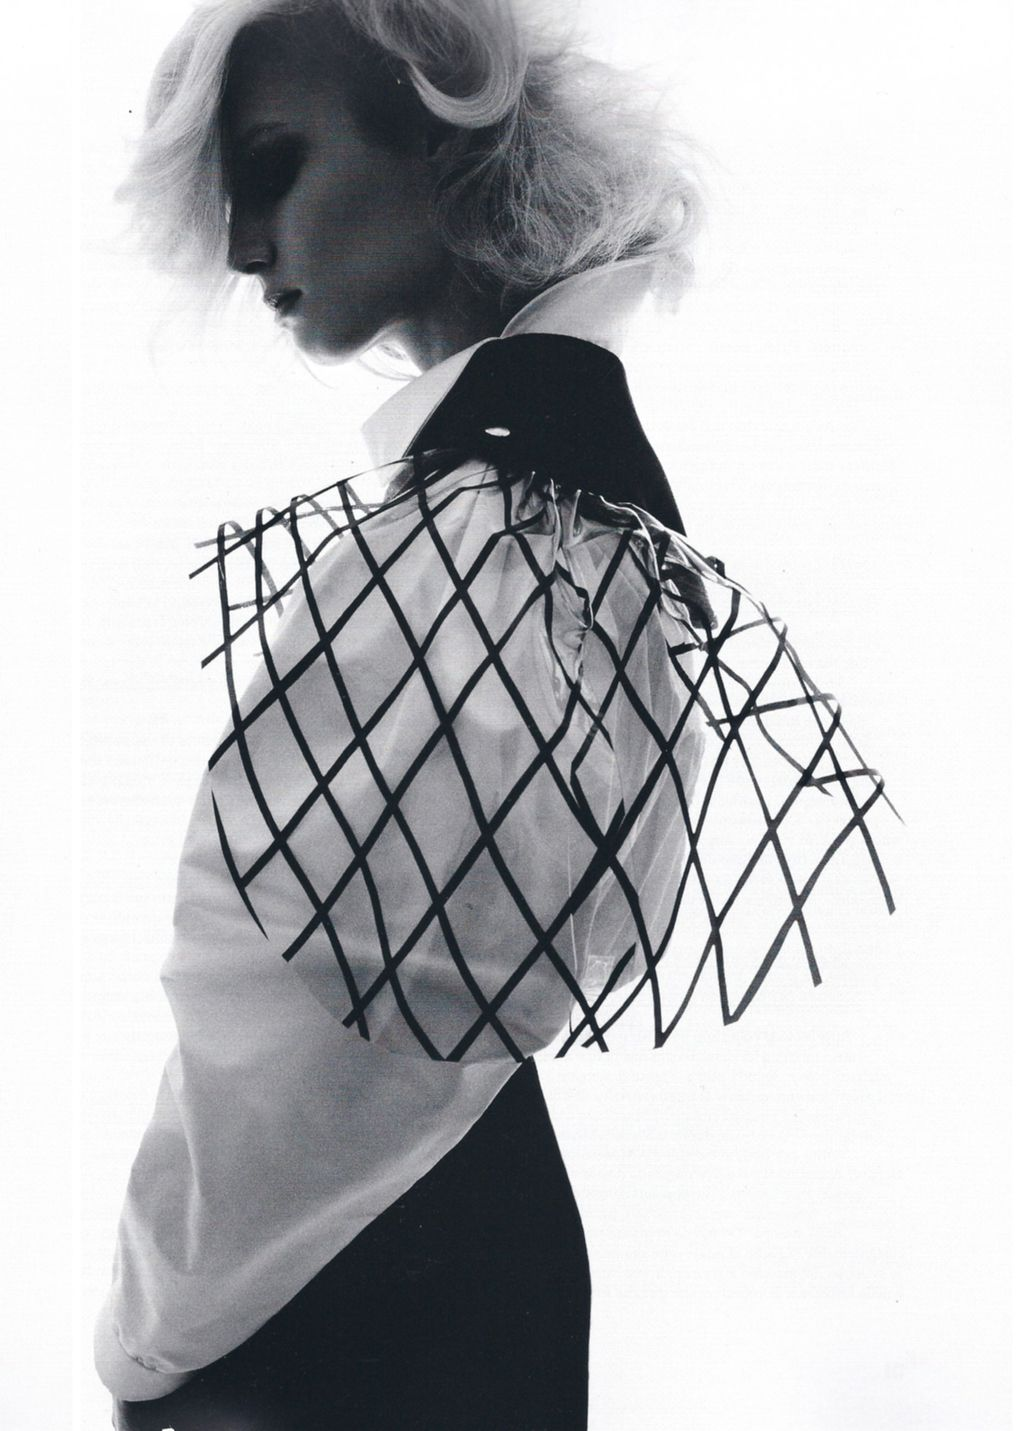 View image: Yves Saint Laurent 7